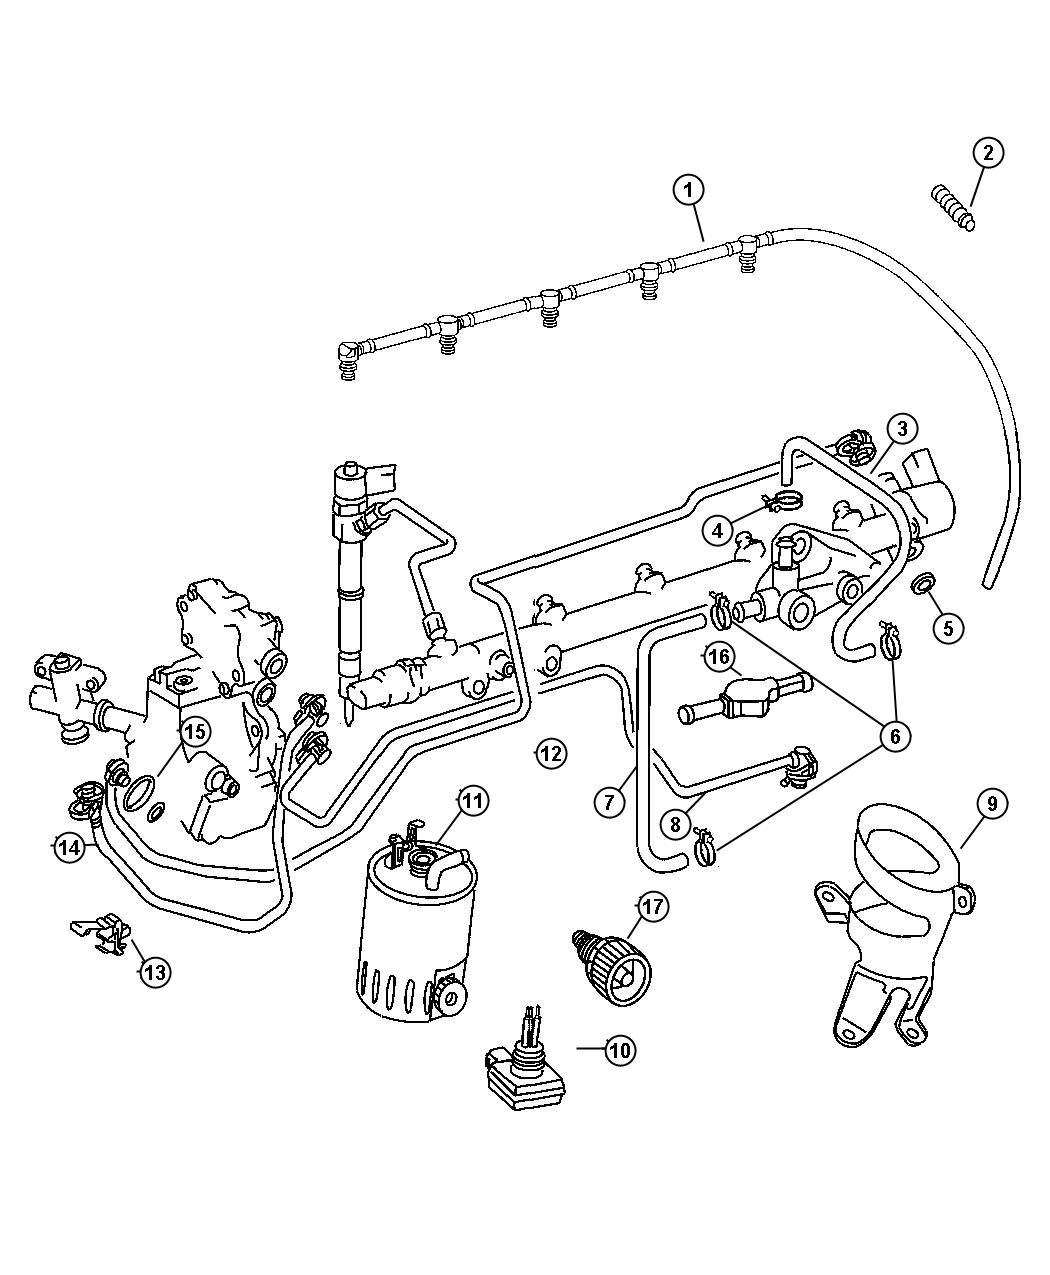 Filter Fuel Lines Diagrams - 2012 Chevy Malibu Fuse Box Diagram -  tomosa35.jeep-wrangler.waystar.fr [ 1275 x 1050 Pixel ]